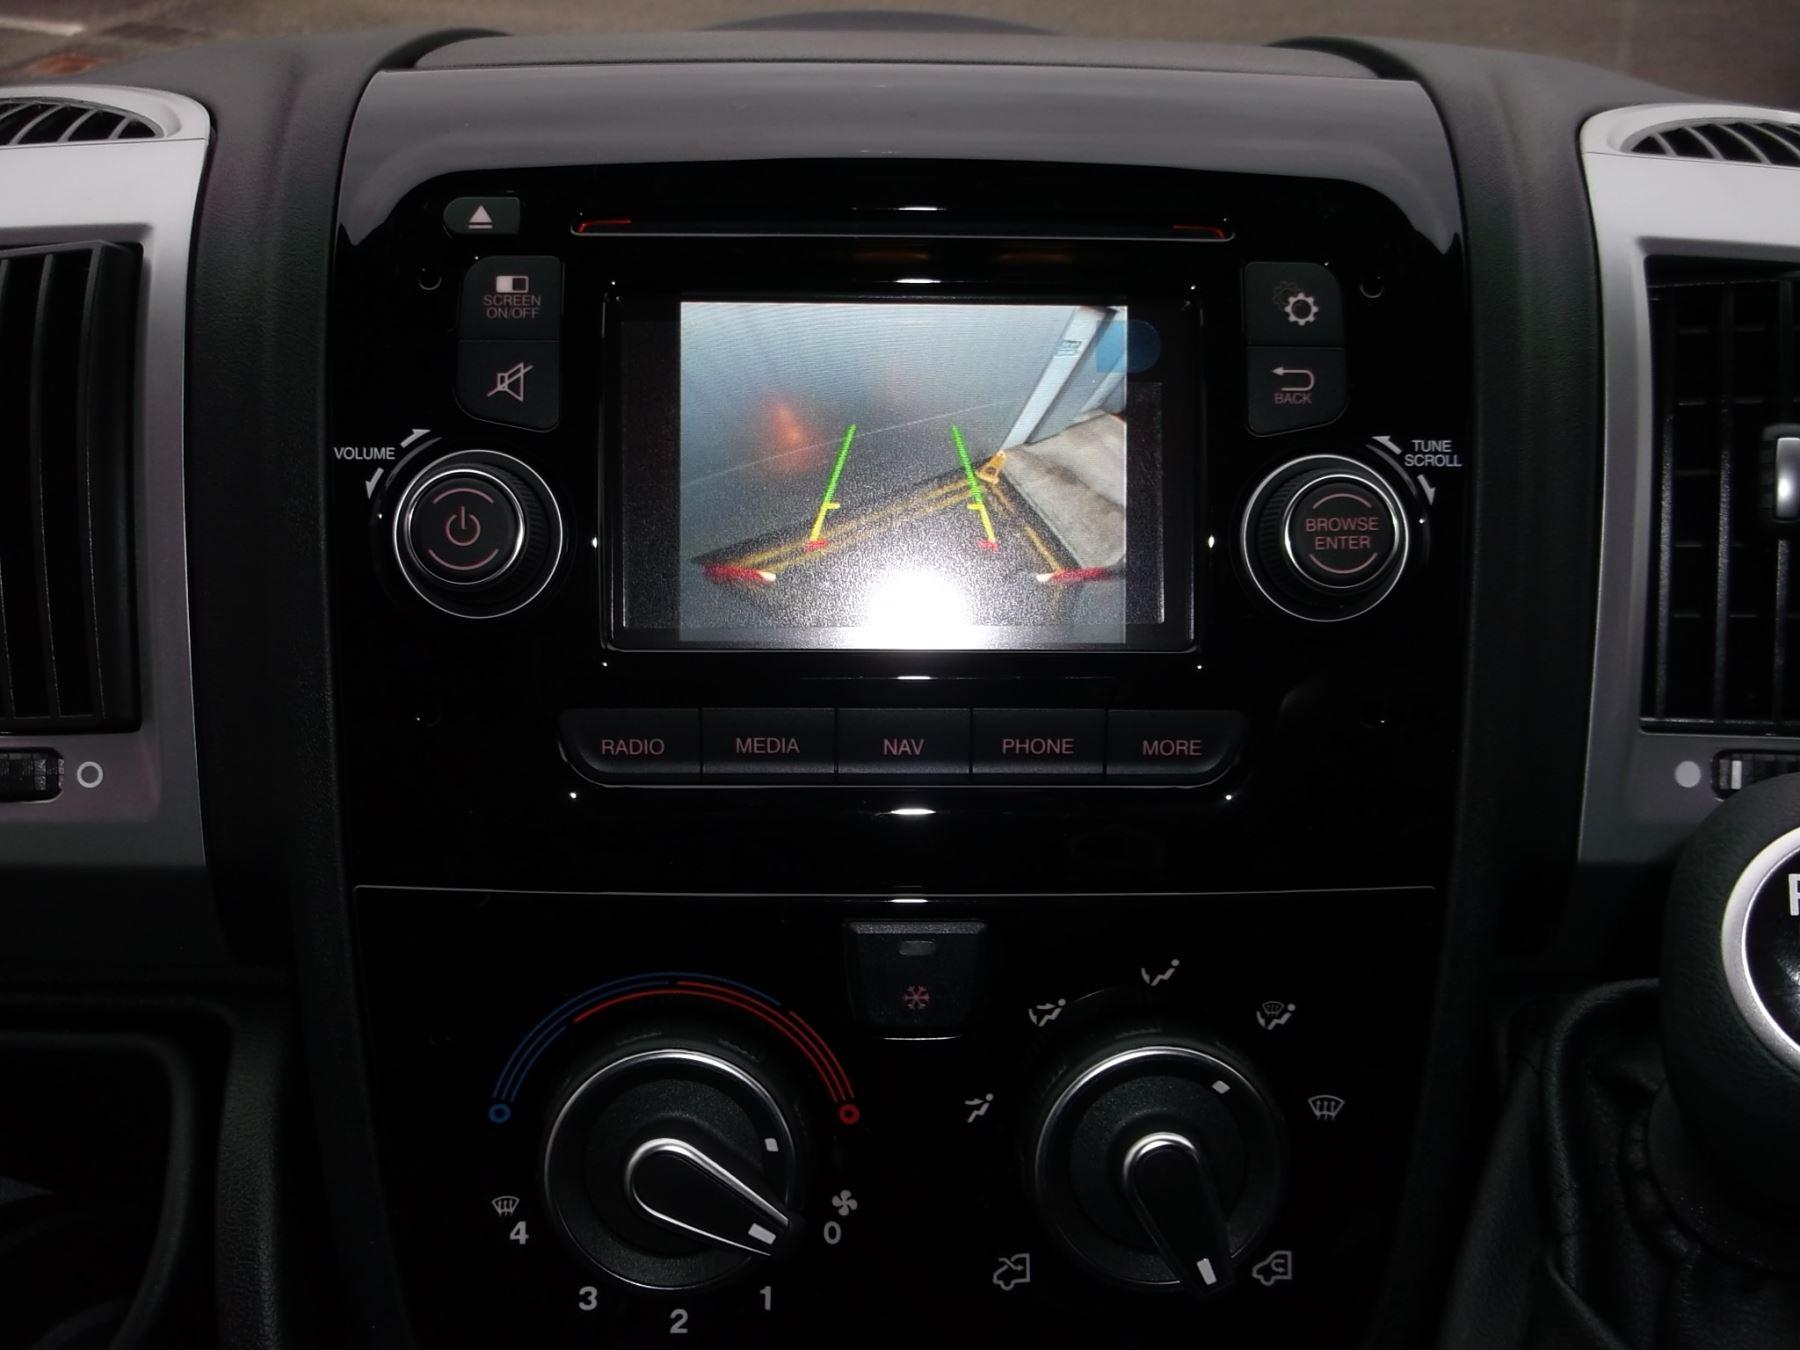 Fiat Ducato MWB HR 2.3 160 SPORTIVO MY20 ALLOYS CLR CODED LED  AIRCON NAV CRUISE REV SENSORS CAMERA image 11